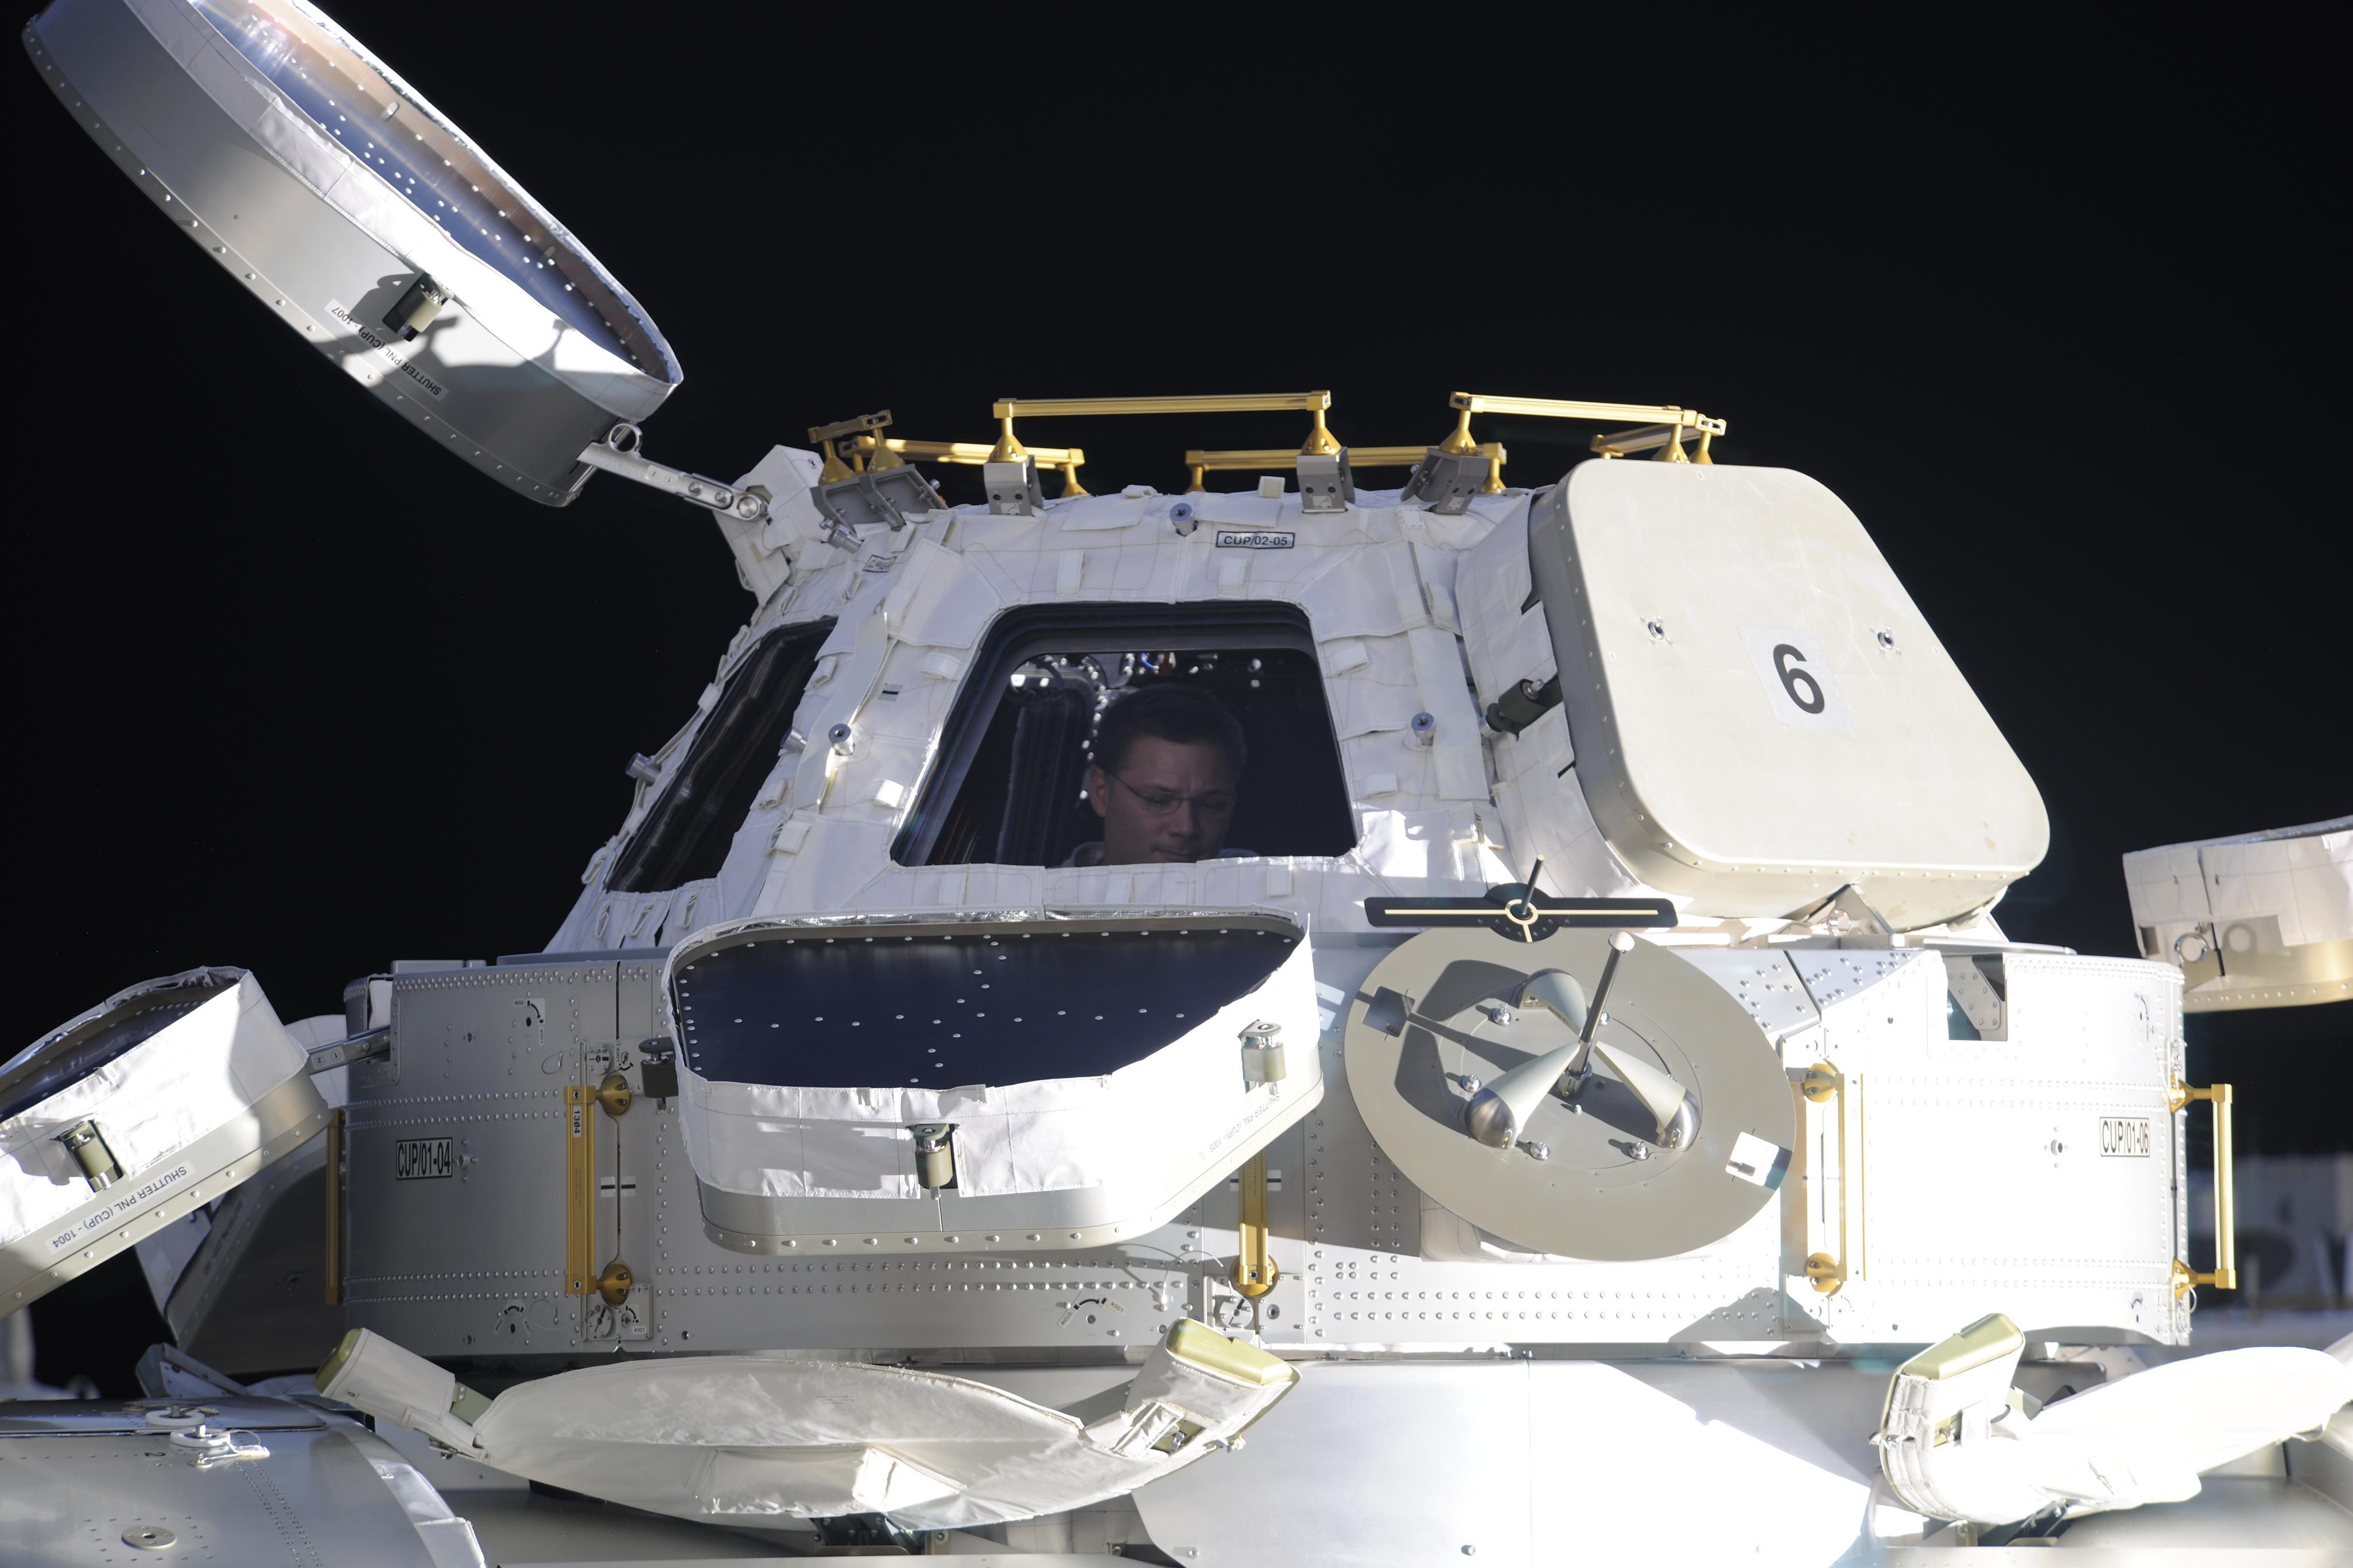 inside space ship docking station - photo #28